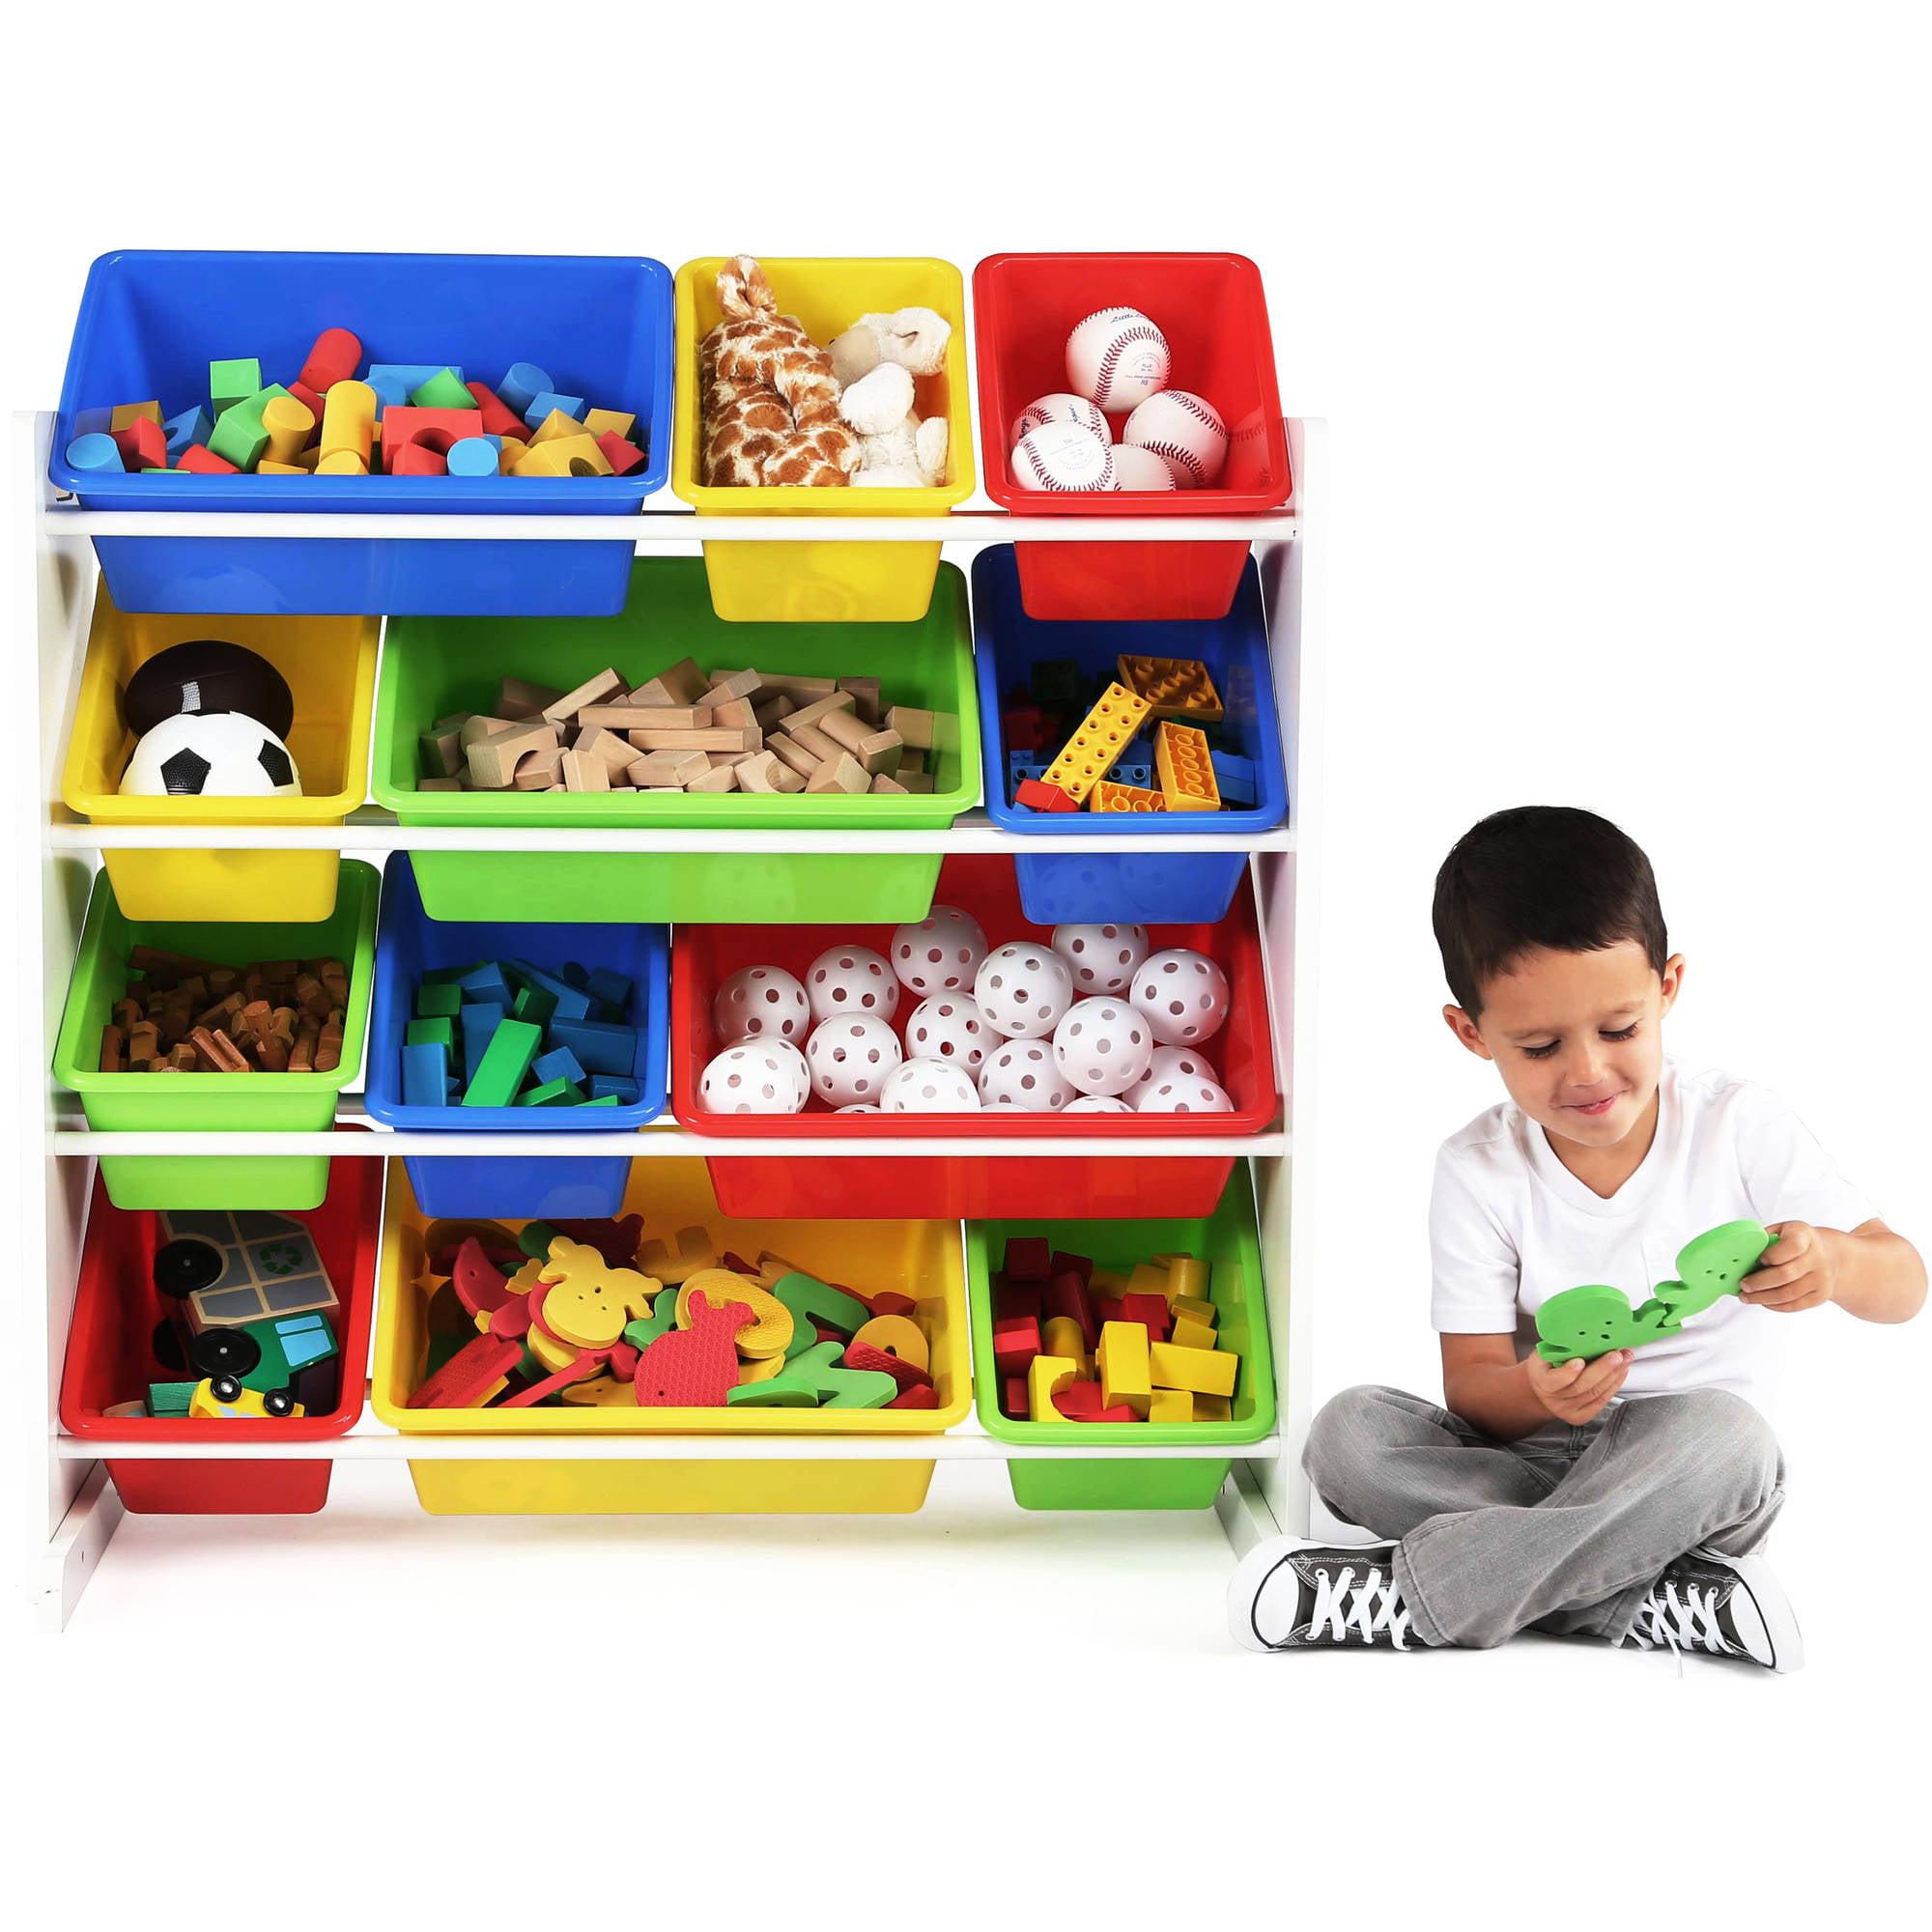 Tot Tutors Kids Toy Storage Organizer With 12 Plastic Bins Multiple